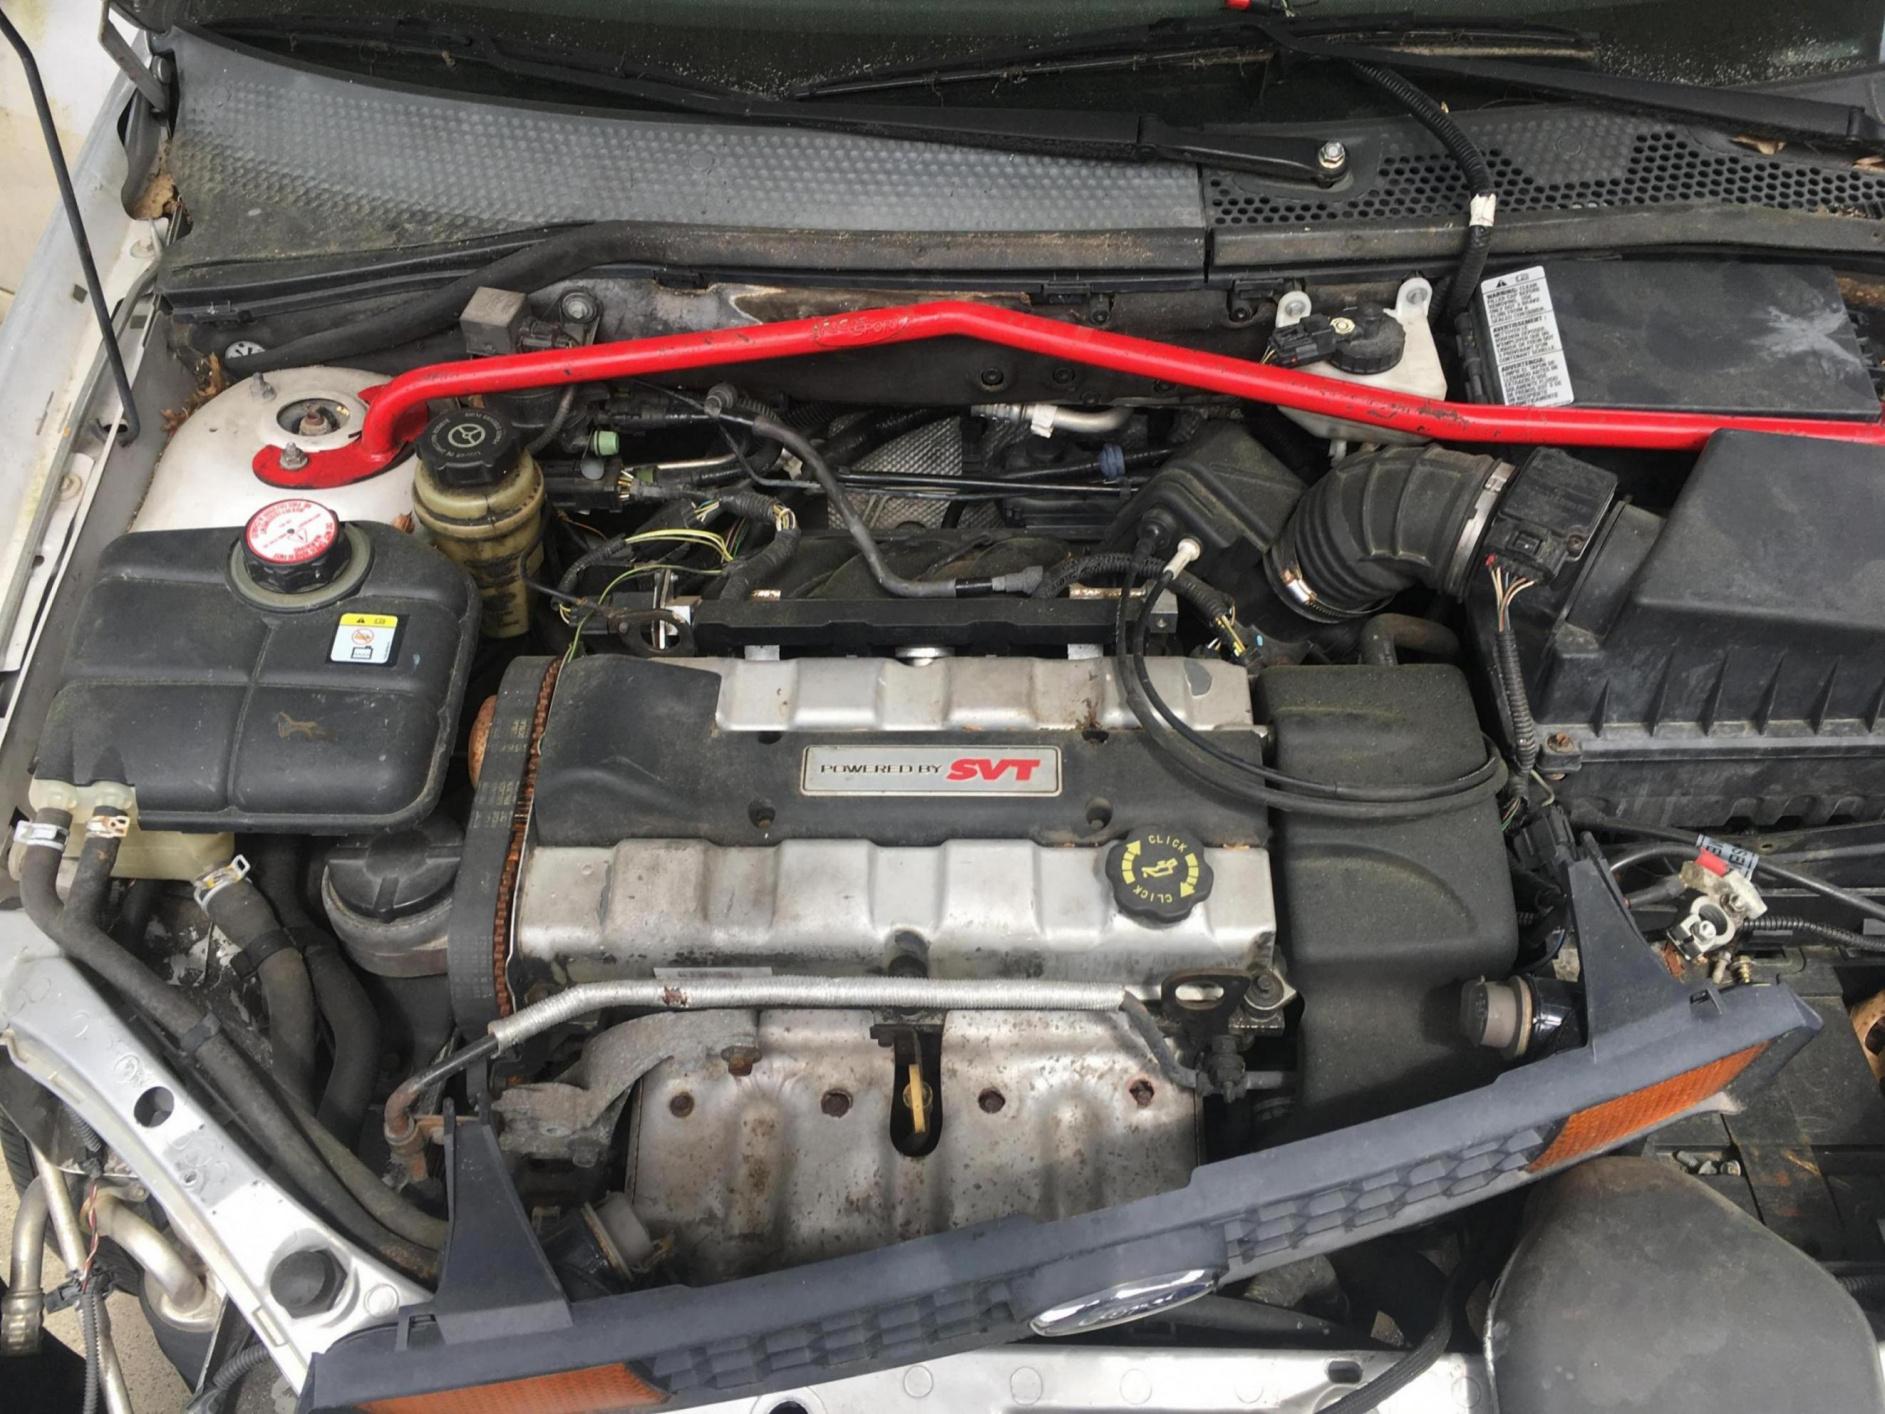 SVT Focus Wagon build-2d699664-1e7f-470b-a8ae-5e66d7539d54_1555153110212.jpg